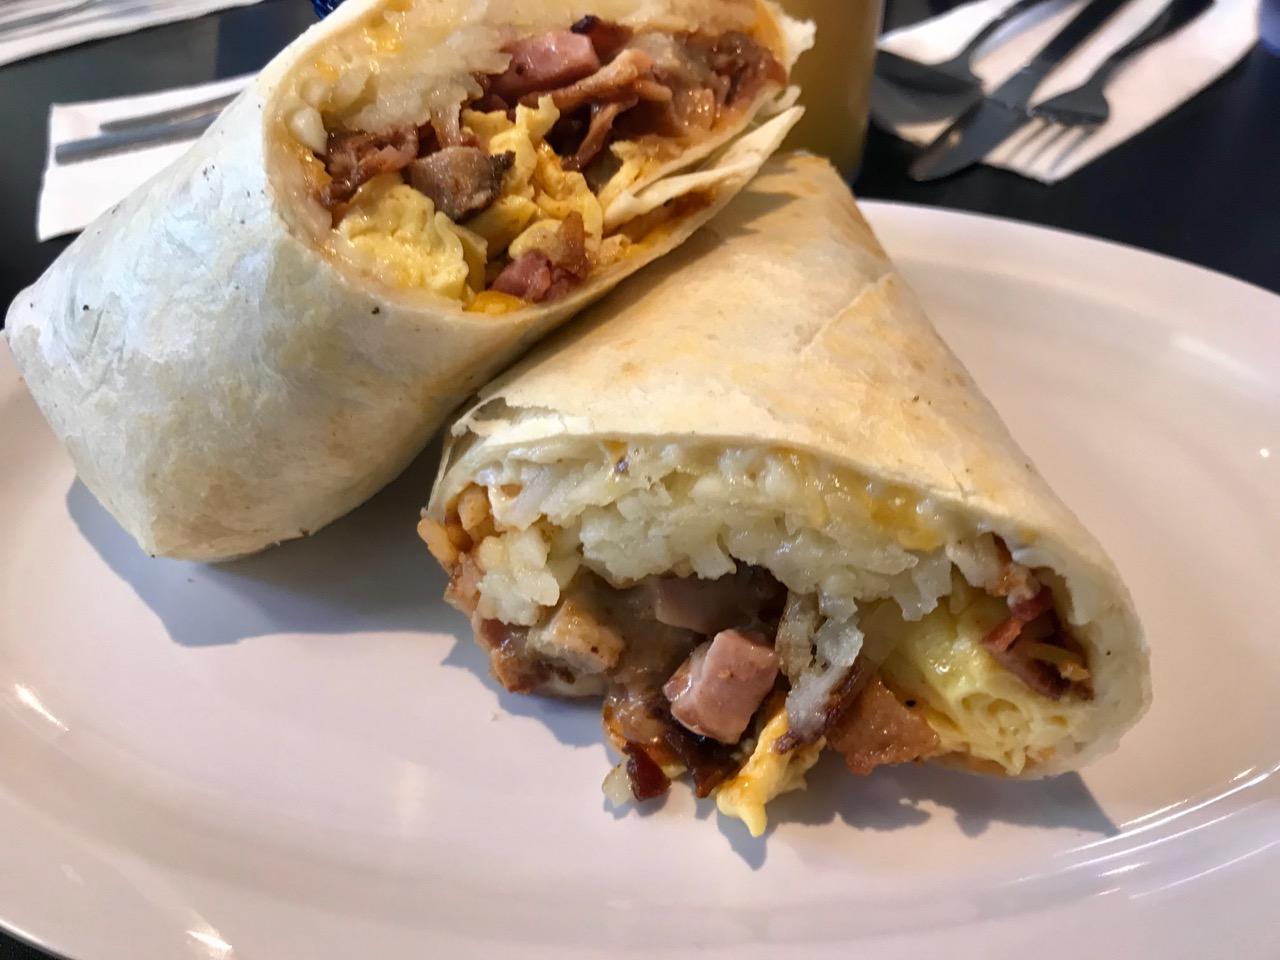 One Helluva Breakfast Burrito at Just Joel's - January 13 2018